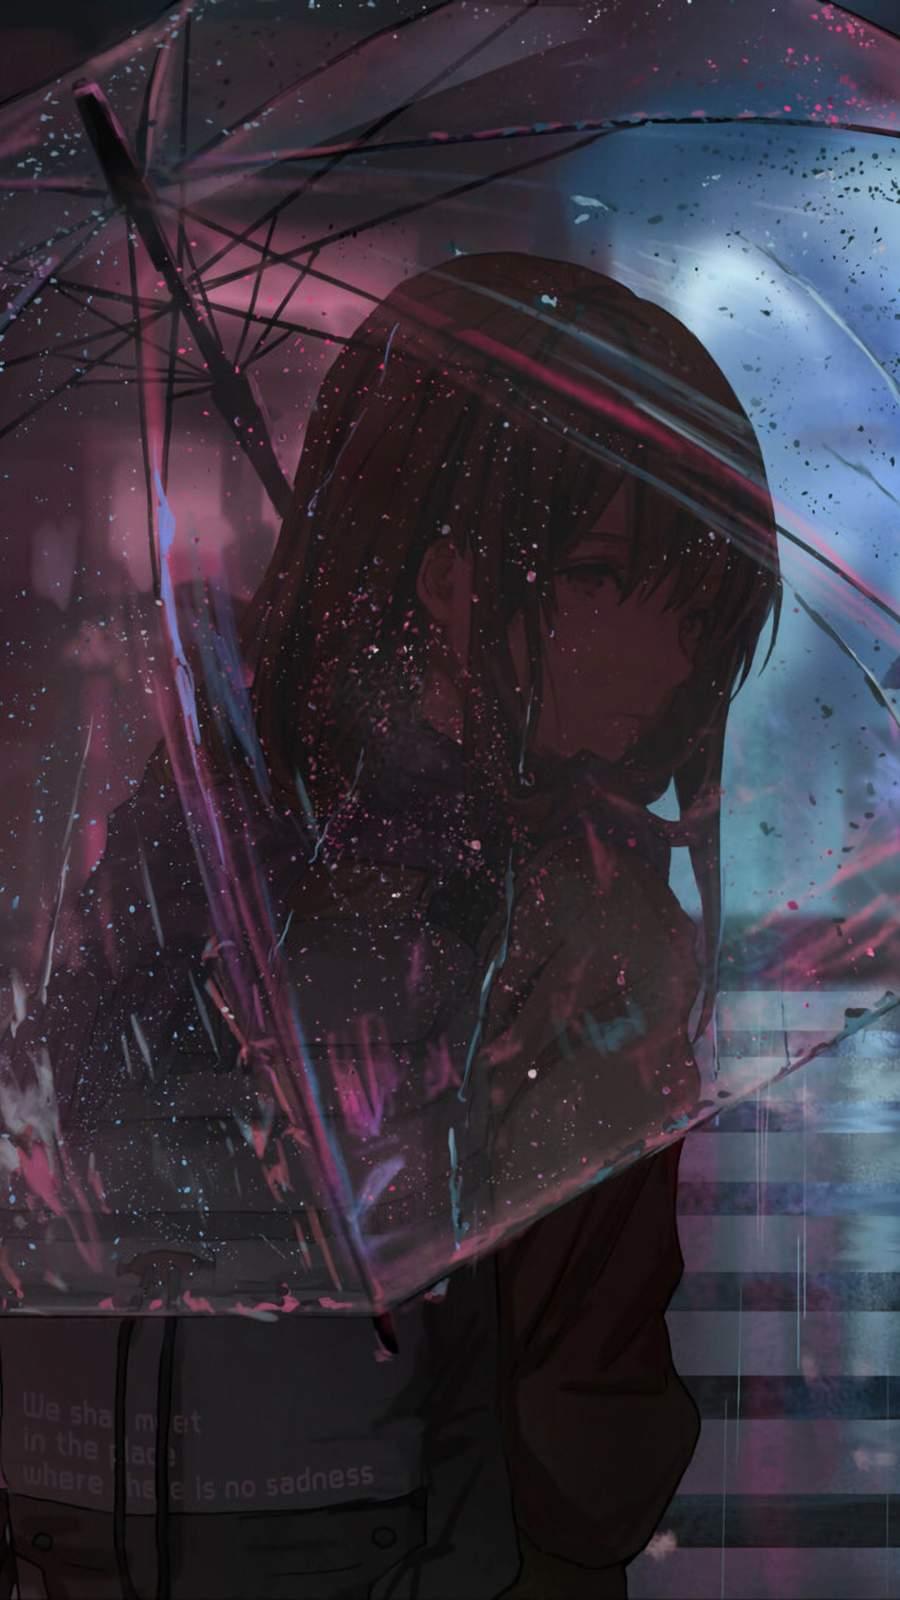 Anime Girl Umbrella iPhone Wallpaper